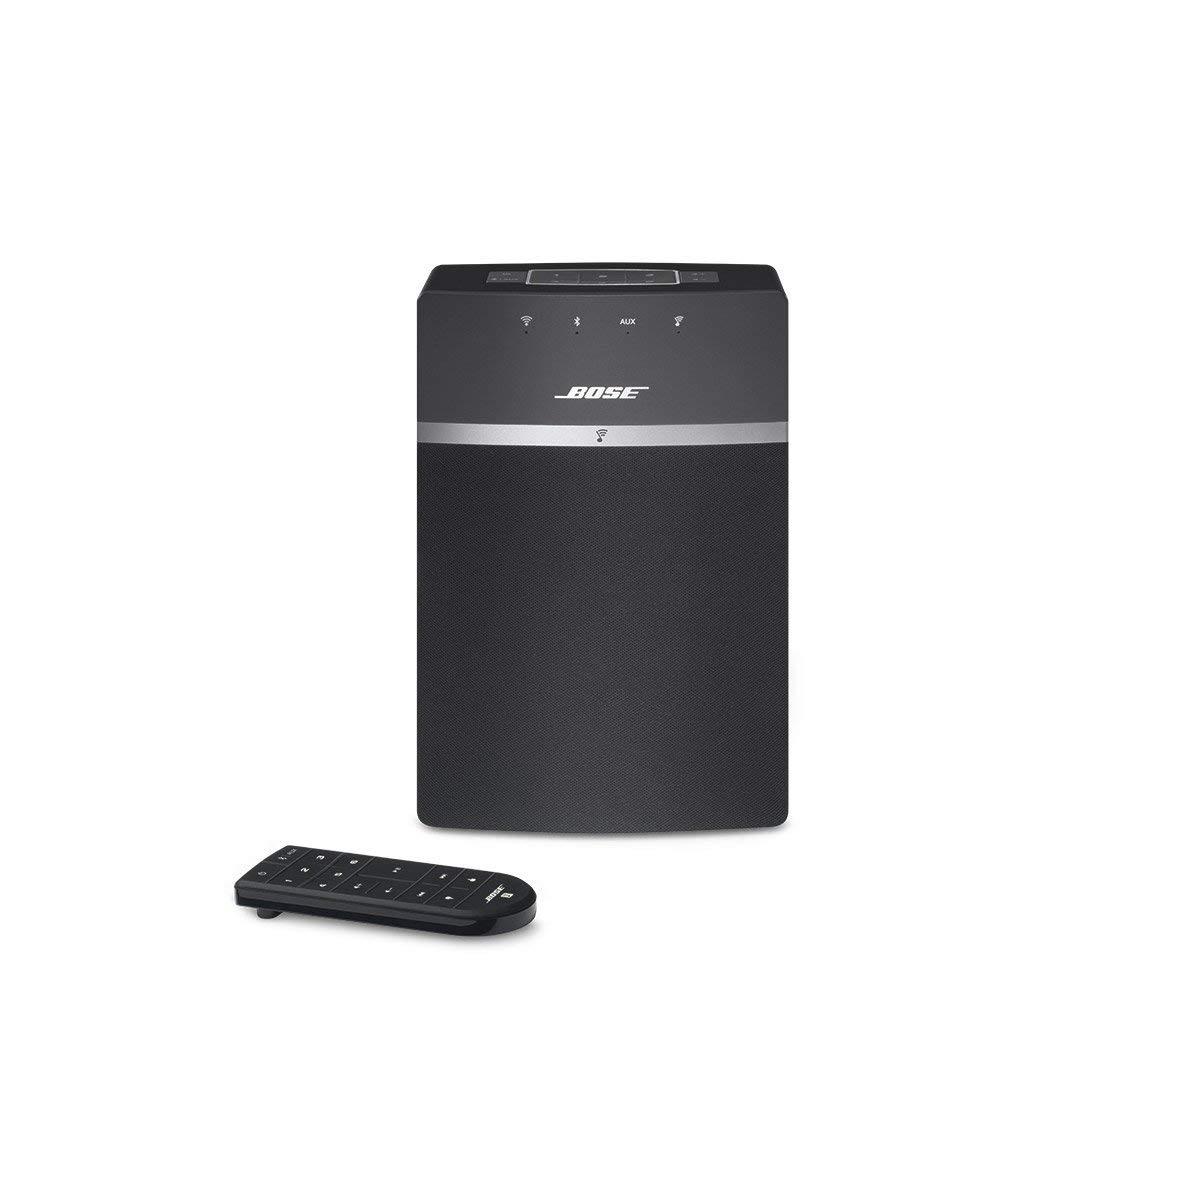 enceinte bose soundtouch 10 syst me audio sans fil compatible amazon alexa. Black Bedroom Furniture Sets. Home Design Ideas